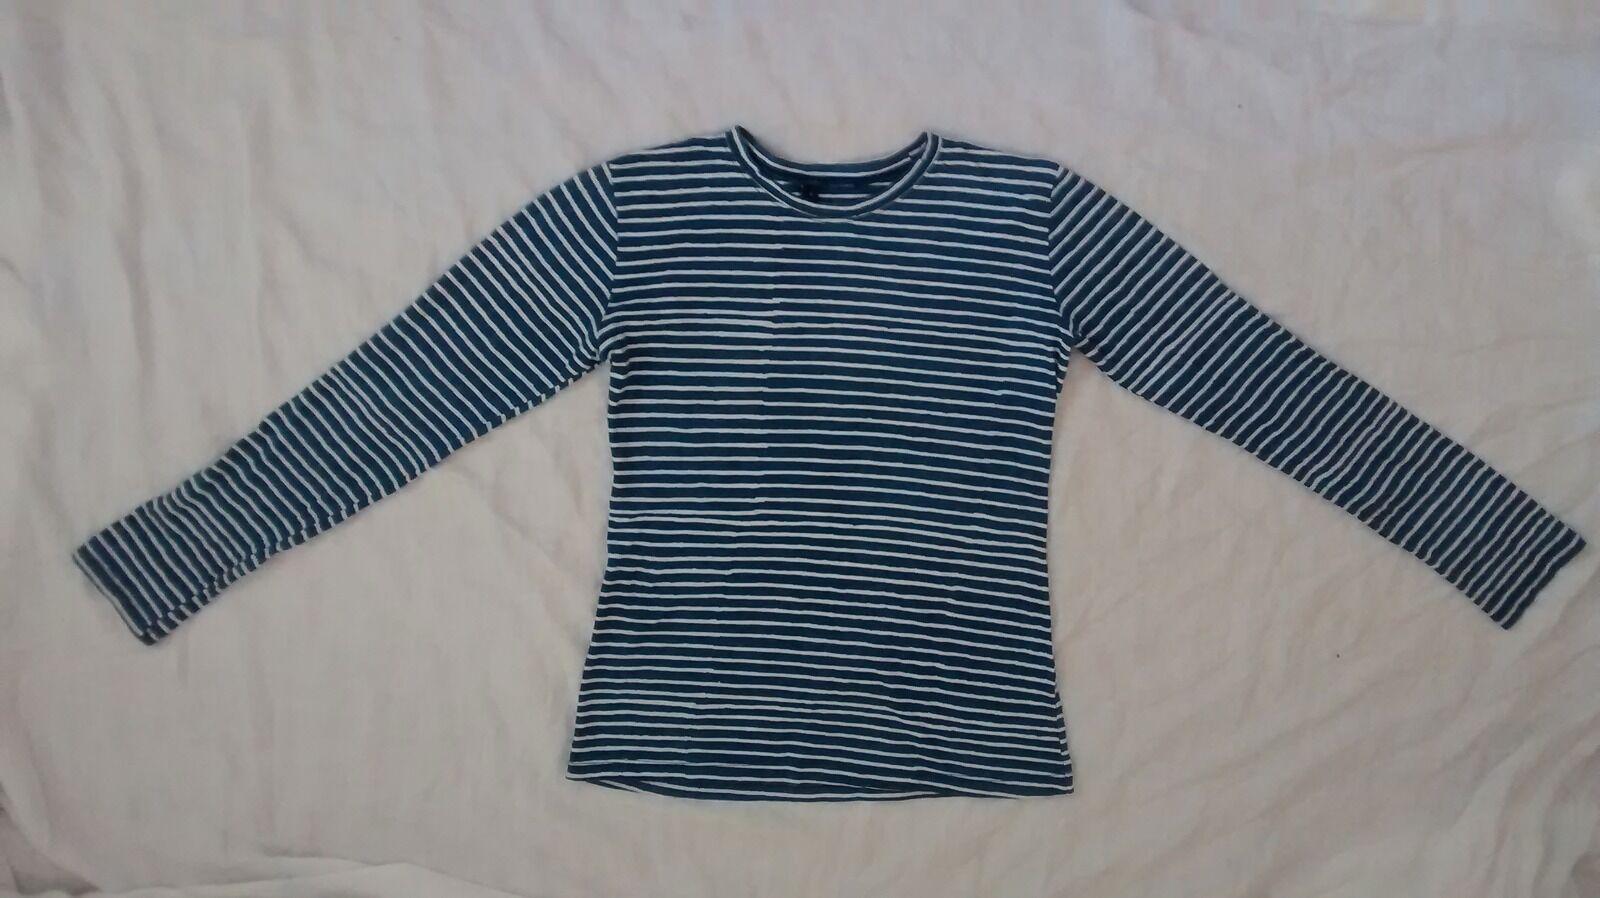 David Bali Studio Wendy Foster Long Sleeve Shirt Größe Small